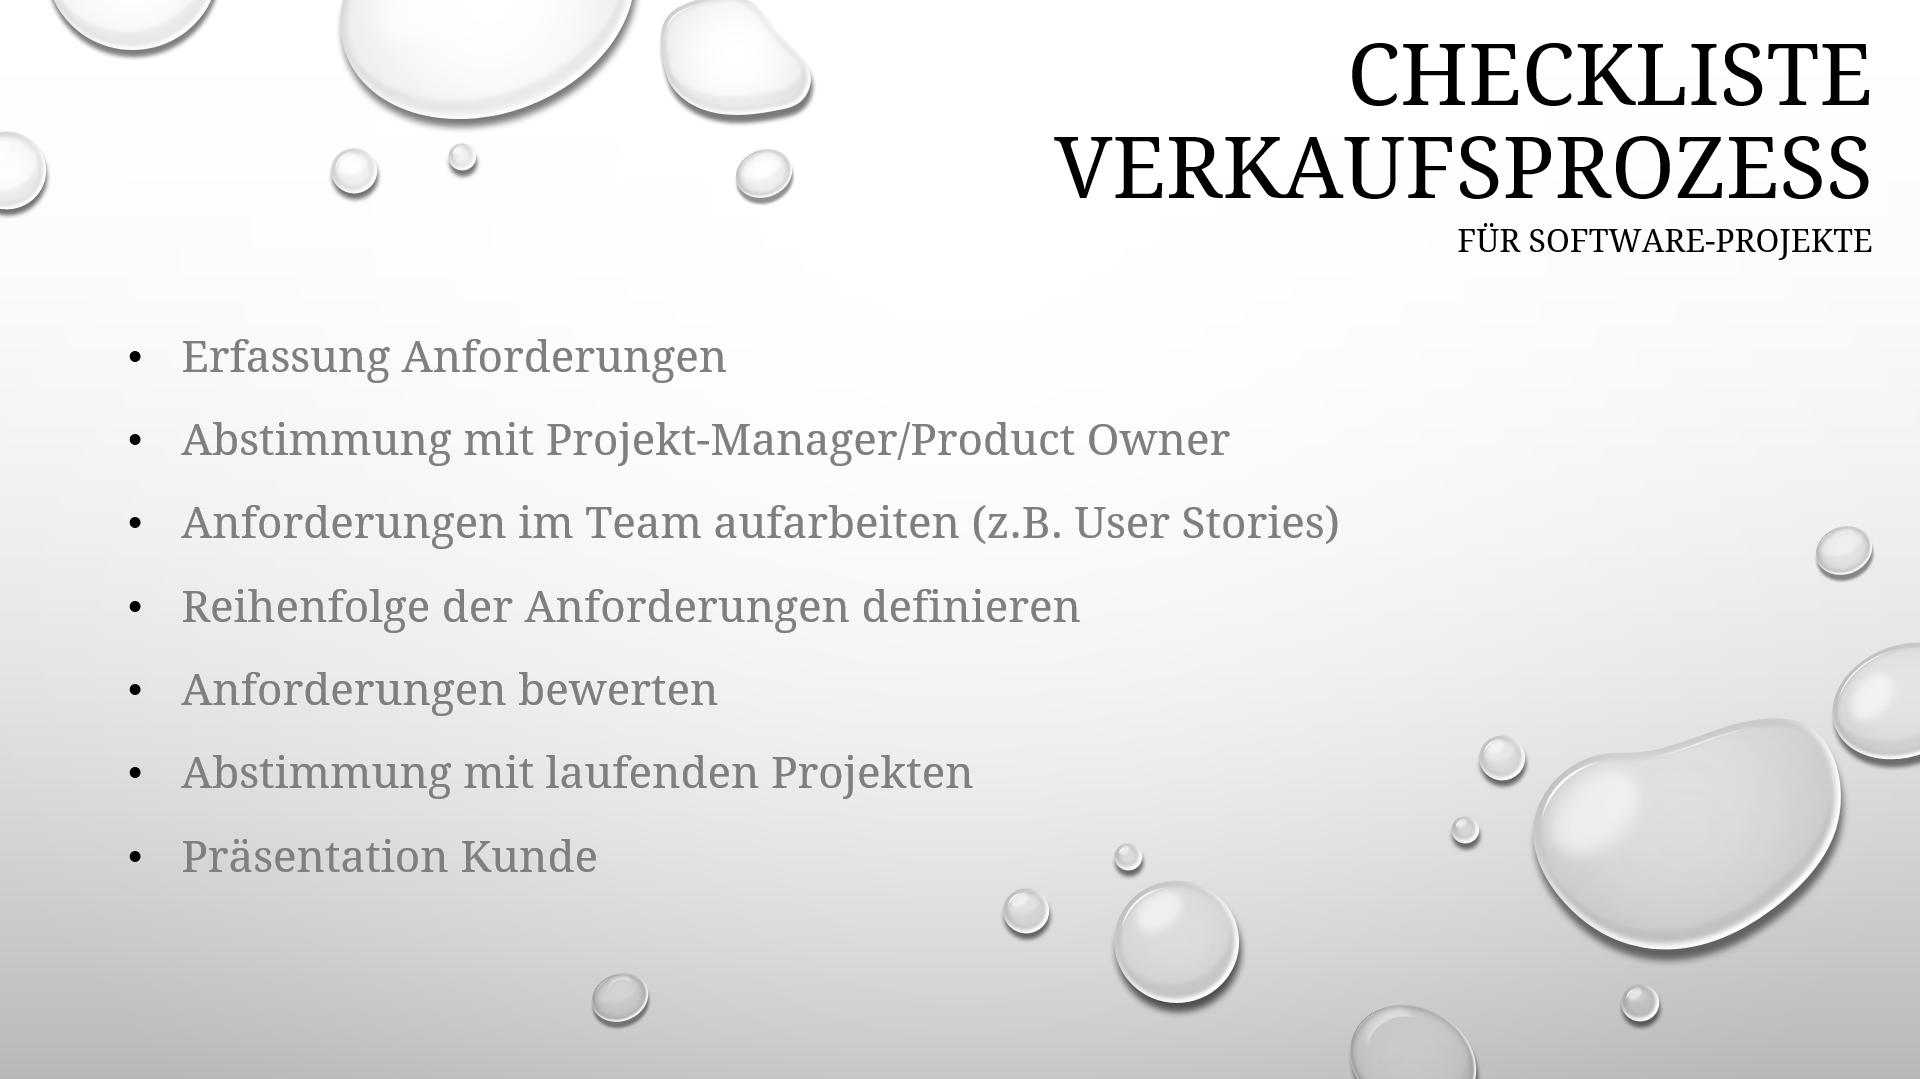 Checkliste Verkaufsprozess bei Software-Projekten